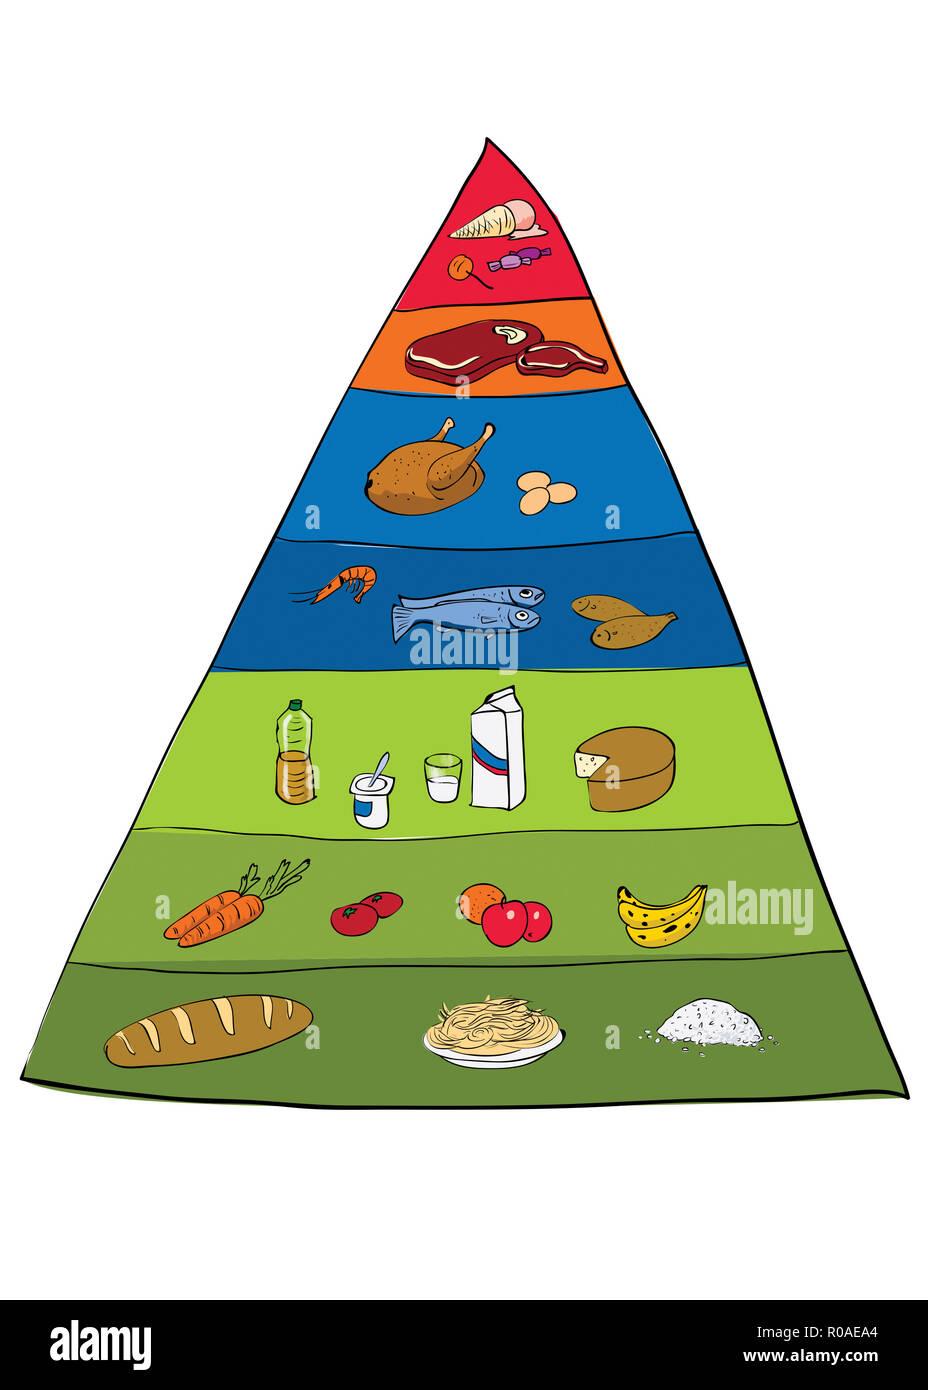 native american food pyramid